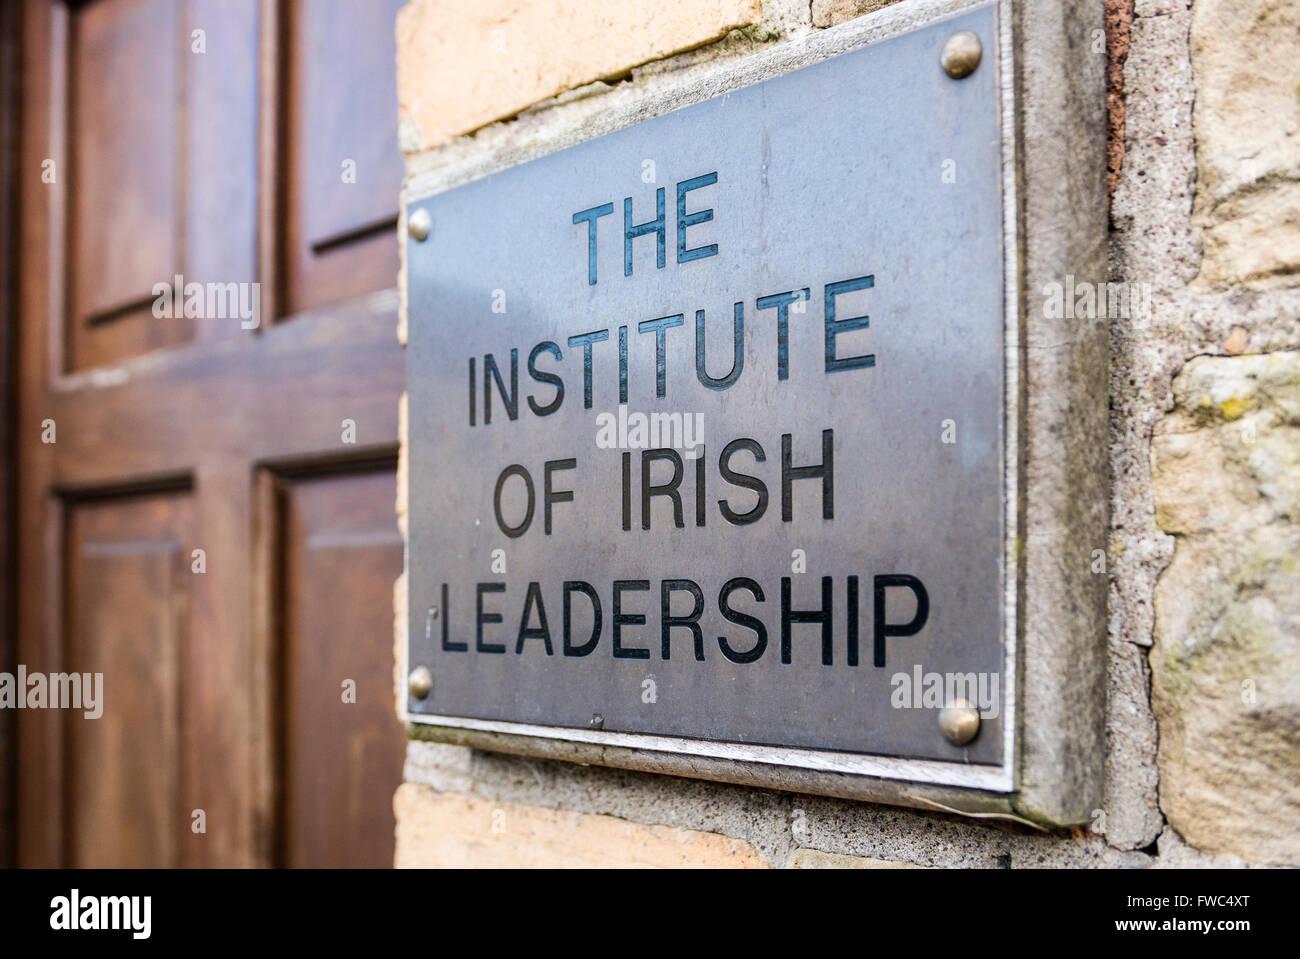 Entrance to the Institute of Irish Leadership, Pomeroy, Northern Ireland, a community based organisation promoting - Stock Image